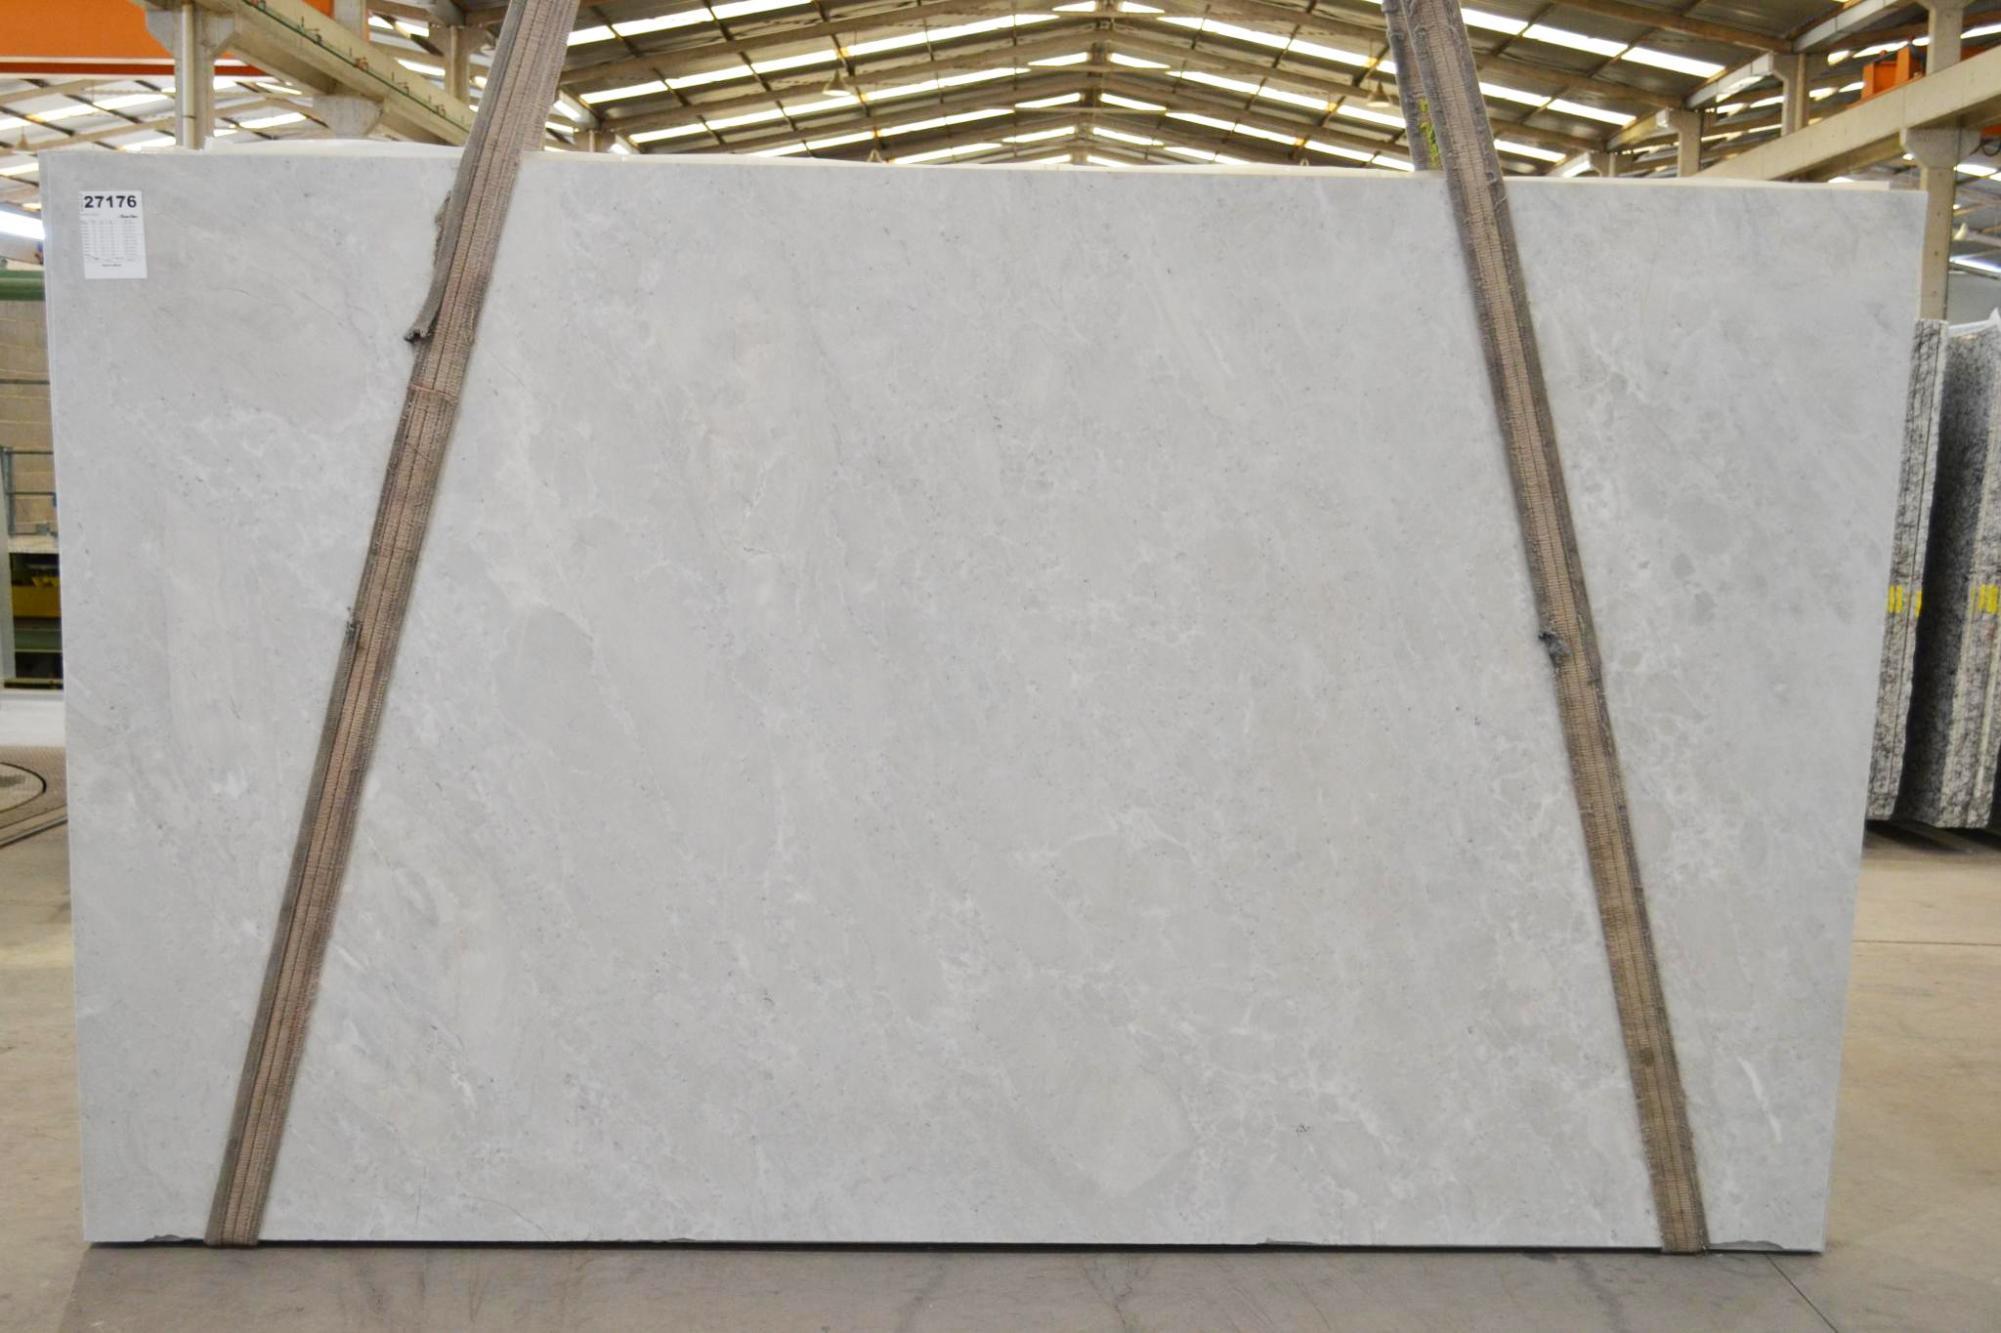 Brazilian Dolomite Supply (Brazil) polished slabs 2465 , Bnd #27176 natural Dolomite